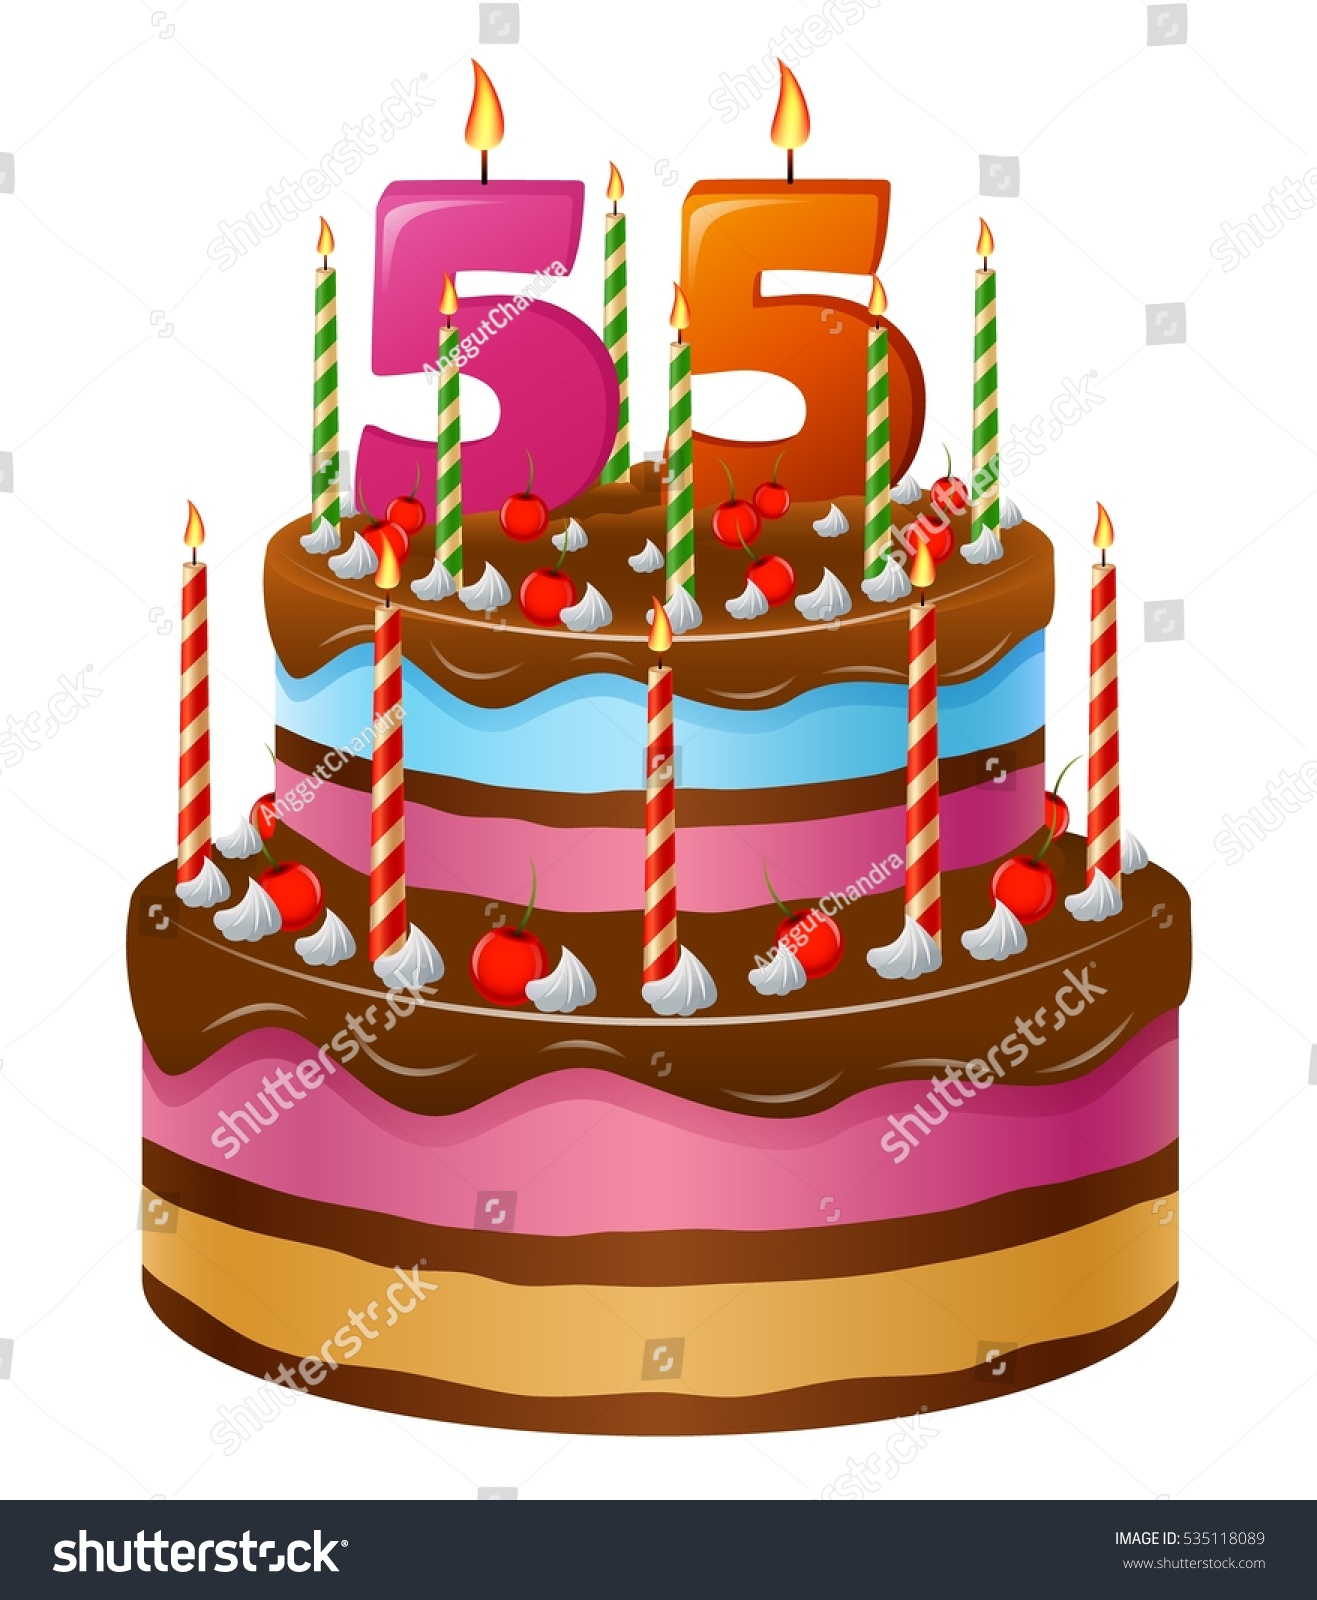 Fine Happy Birthday Cake 55 Stock Vector Royalty Free 535118089 Personalised Birthday Cards Paralily Jamesorg